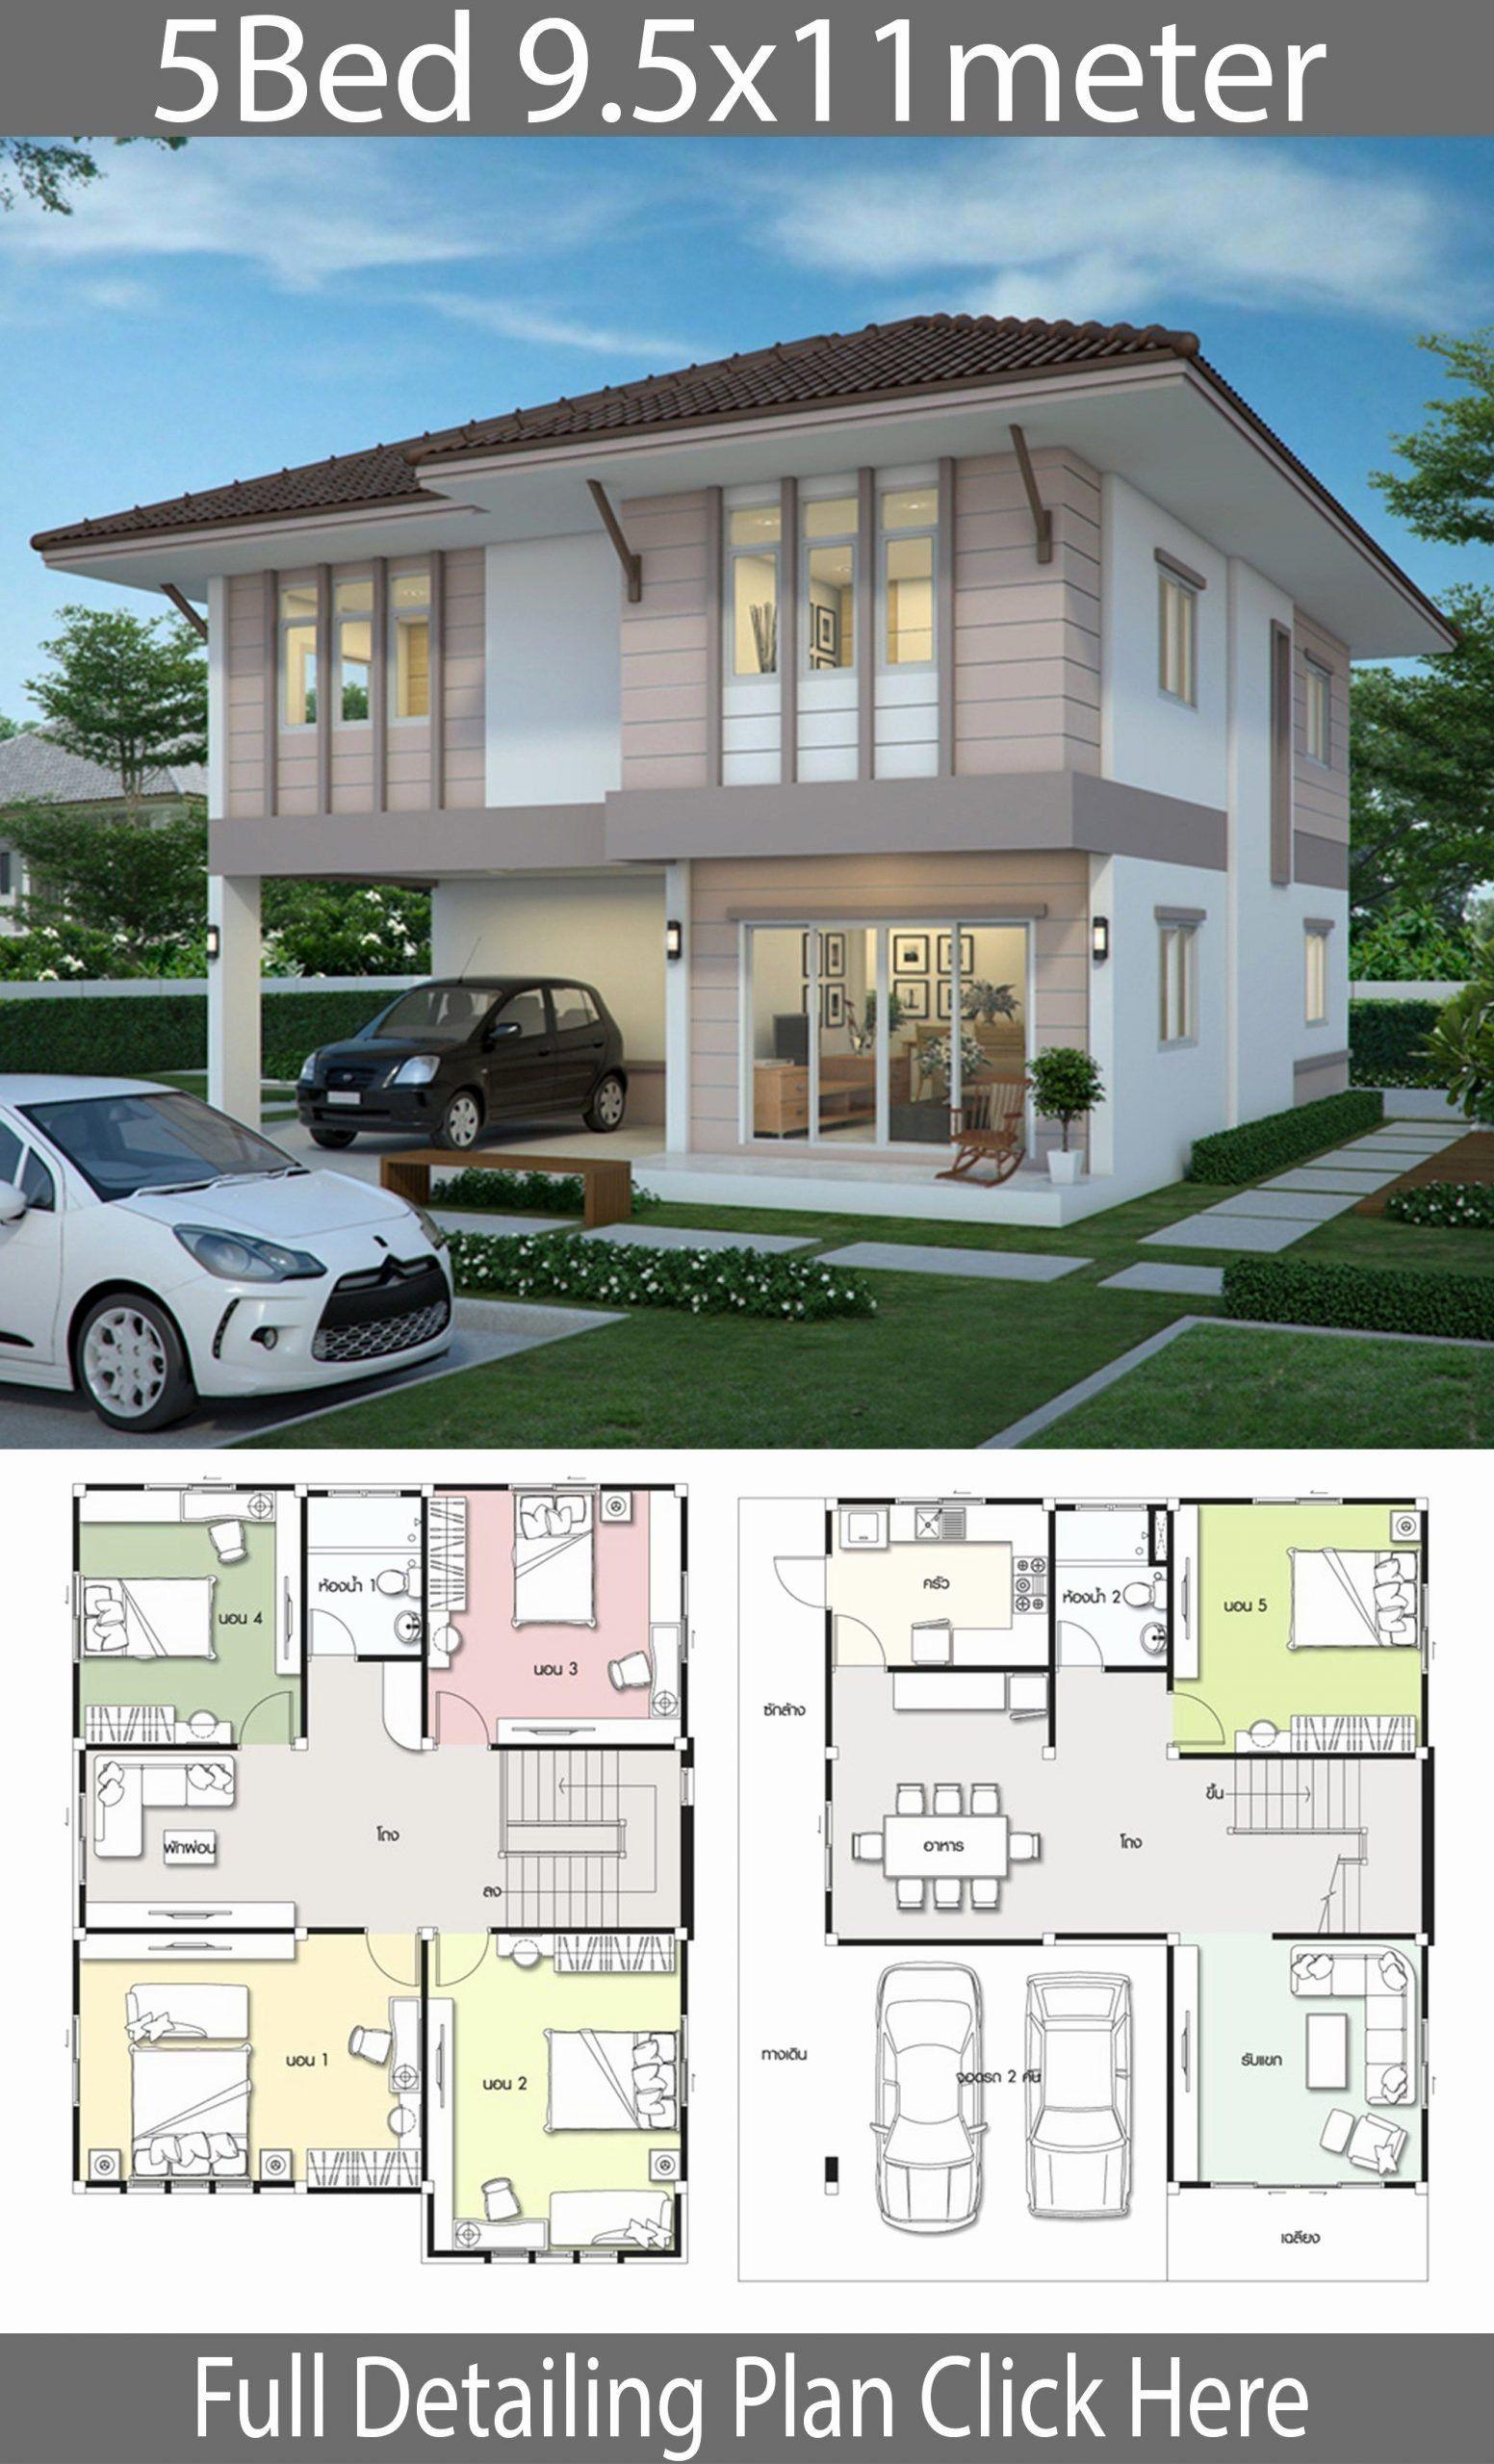 5 Bedroom Bungalow House Plans Fresh House Design Plan 9 5x11m With 5 Bedrooms In 2020 Bungalow House Plans House Construction Plan House Plans